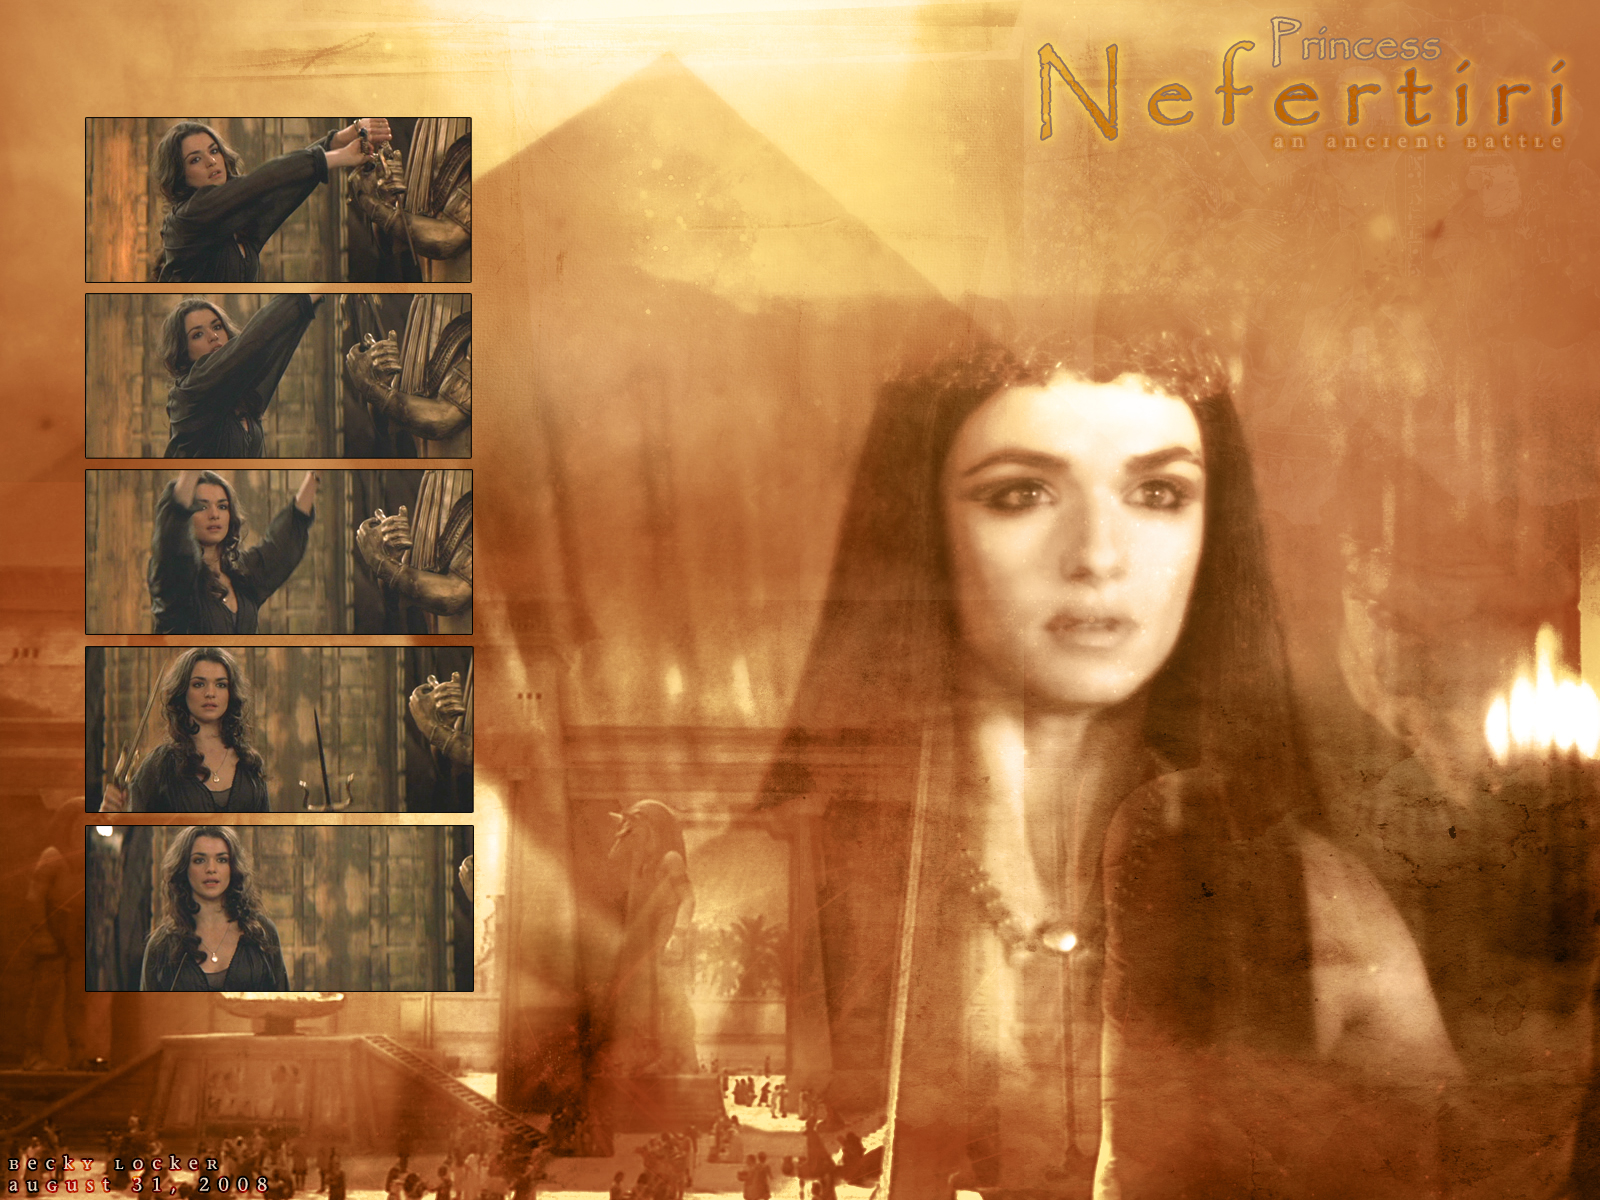 princess nefertiri by saiyanprincessx on deviantart